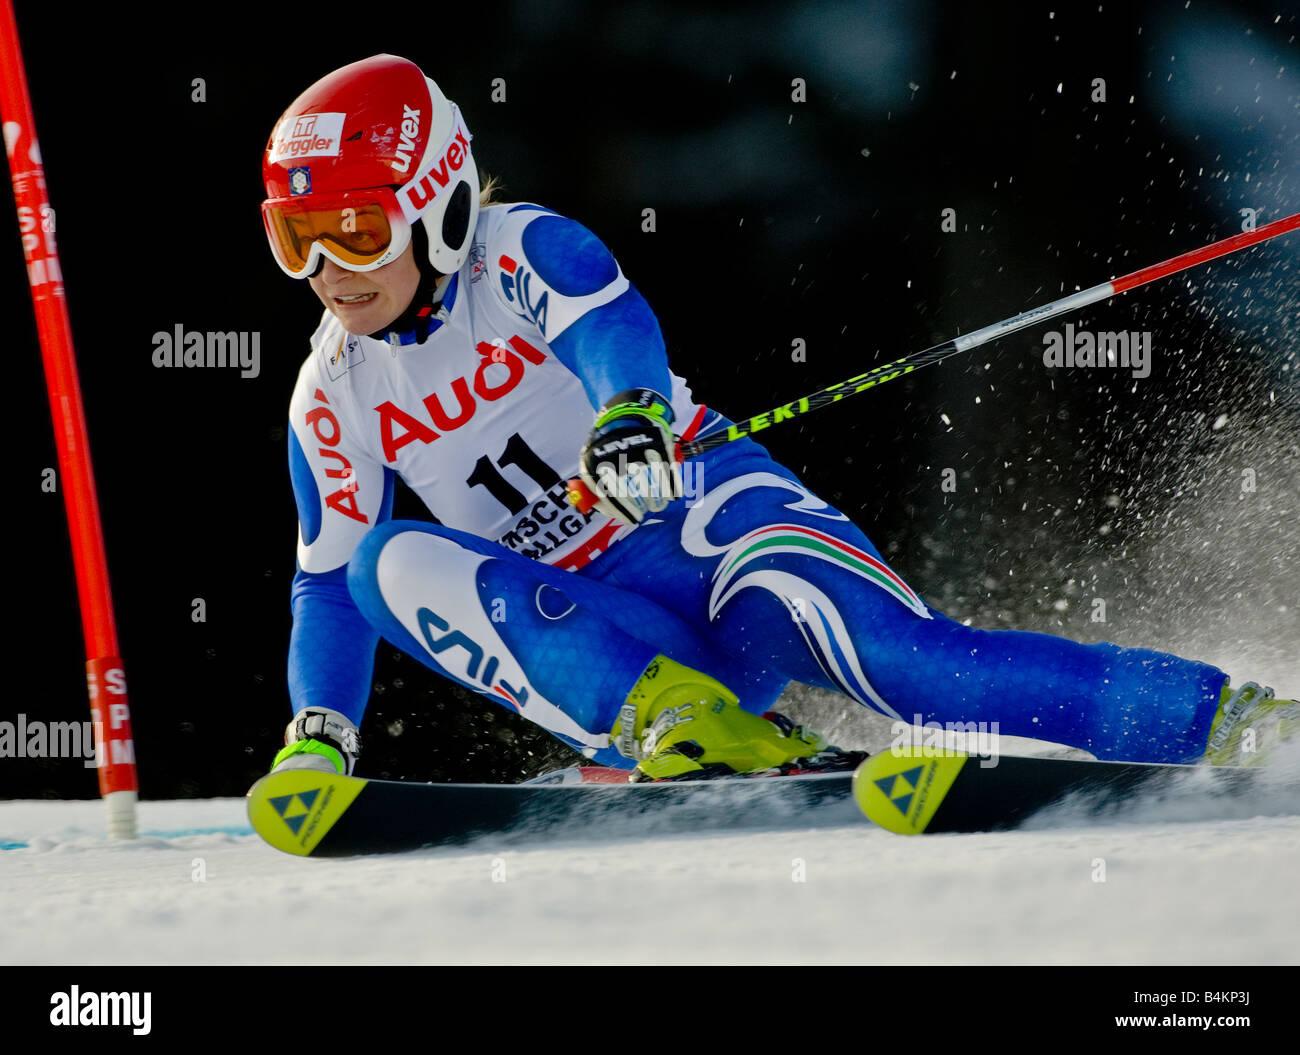 GIUS Nicole Italien - Weltcup Super Giant Ofterschwang 26 01 2008 - Stock Image